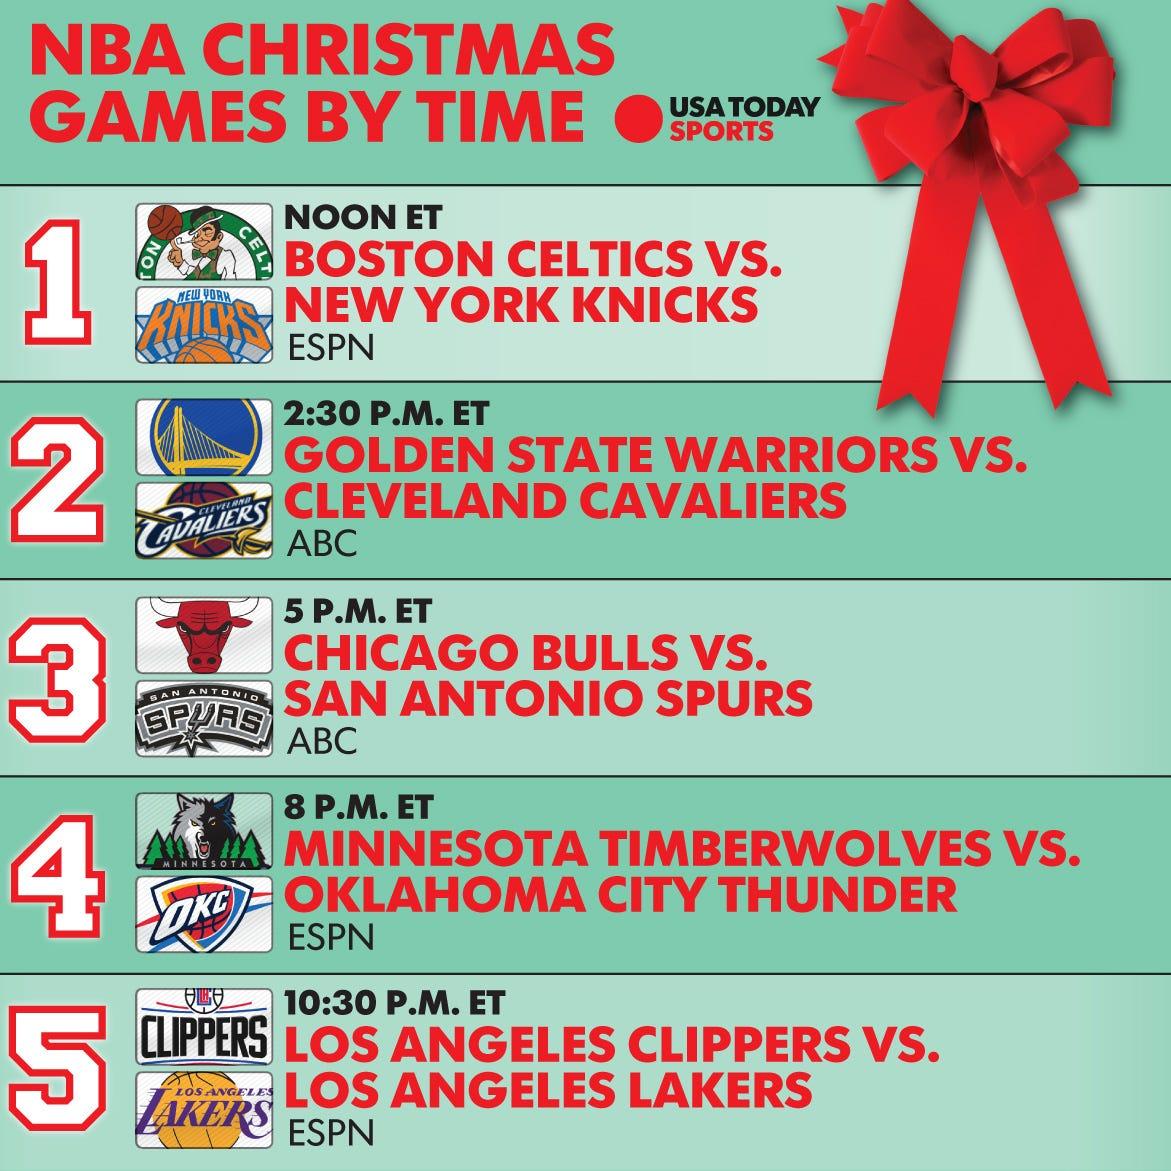 NBA Christmas Day Games · NBA Discussion · Disqus 7ff6494a7c2a